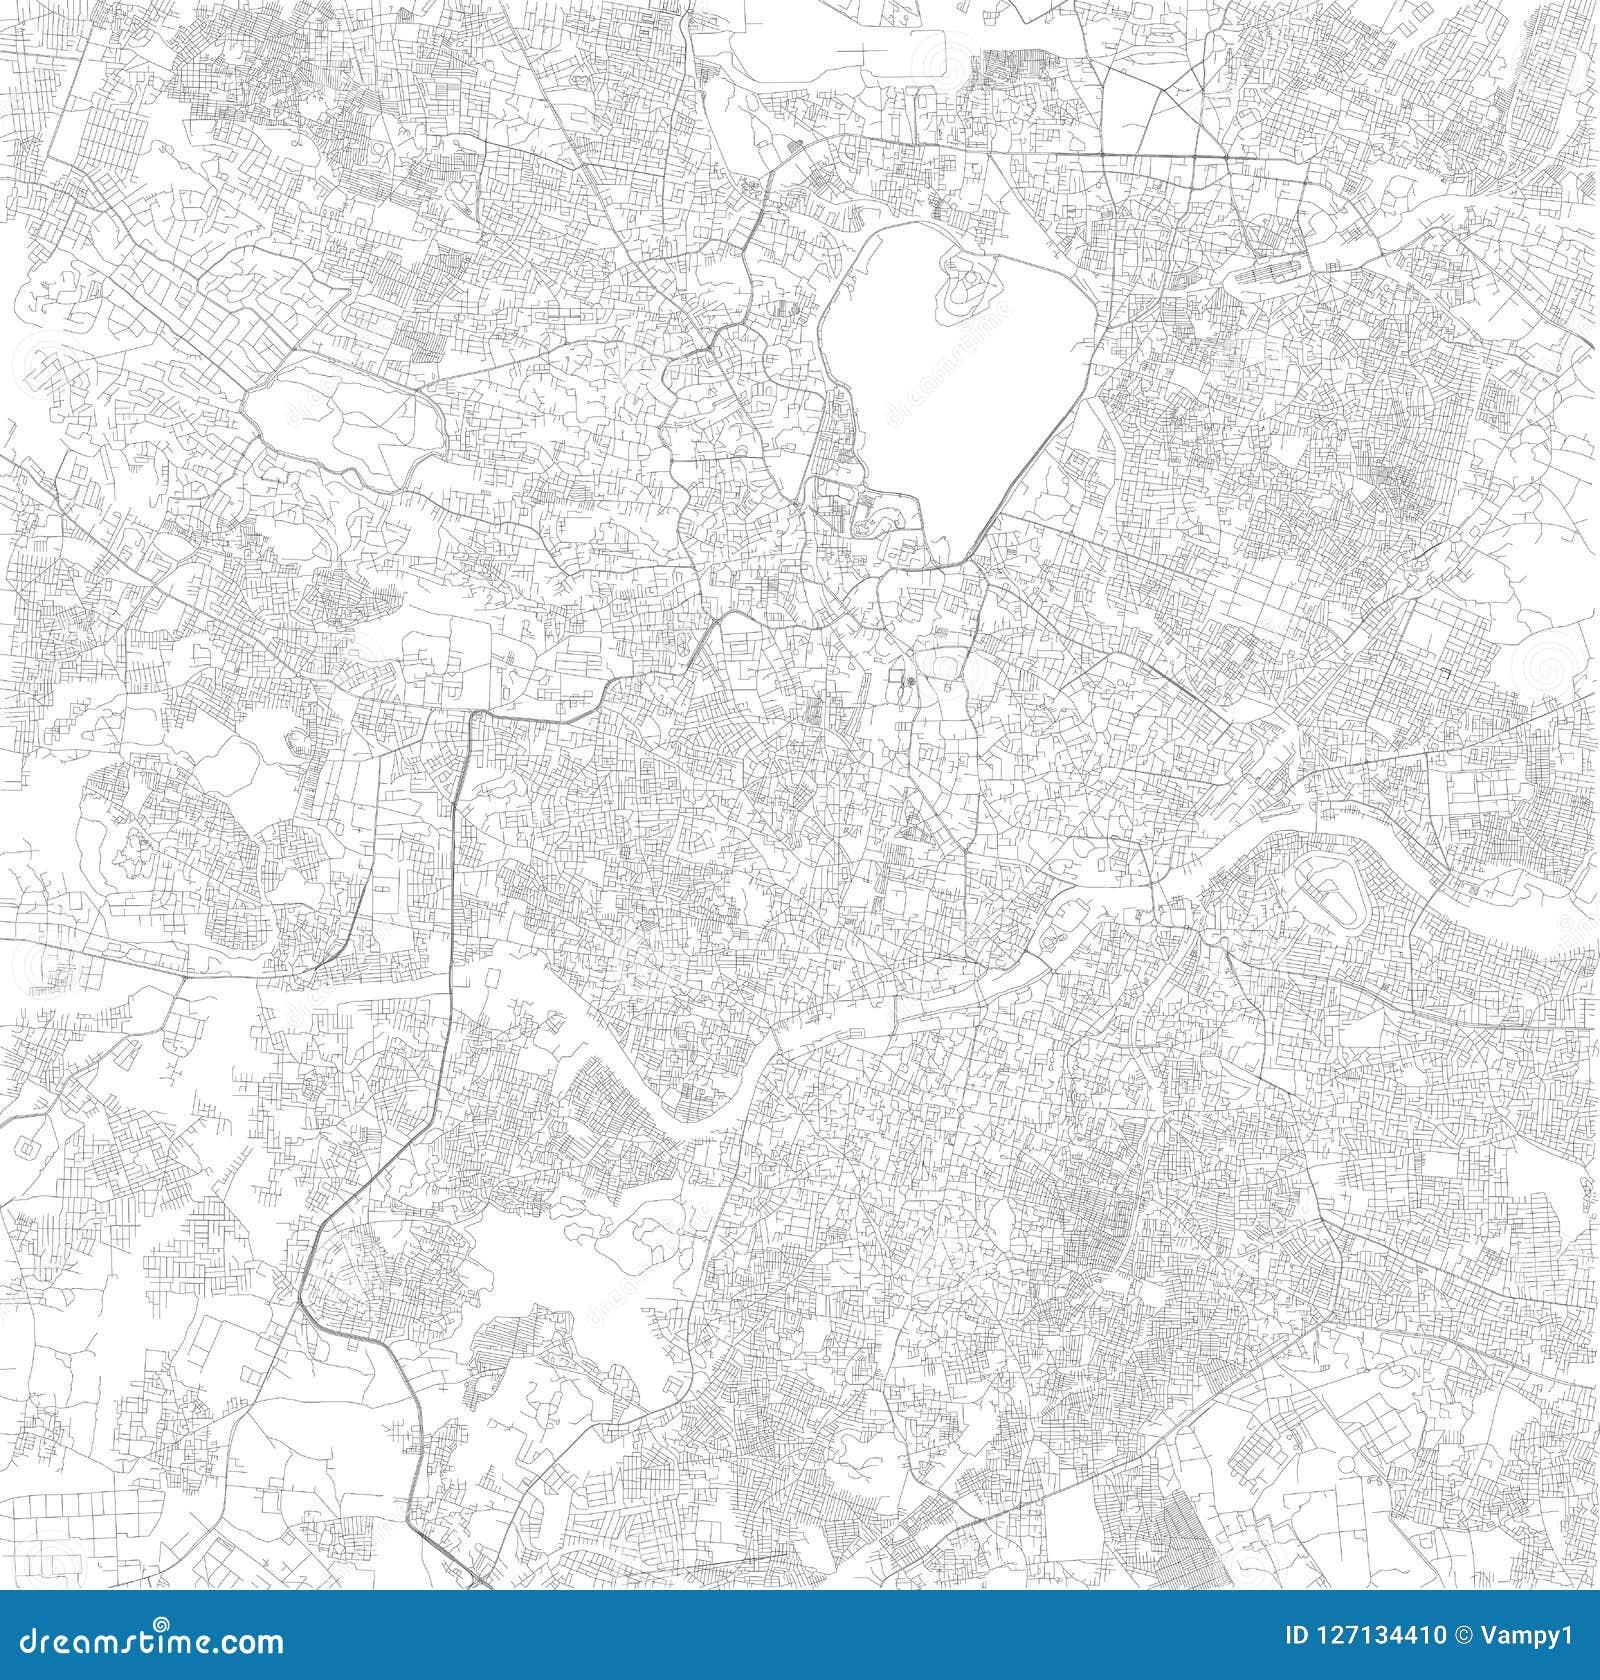 Map Of Hyderabad Telangana Satellite View Black And White Map